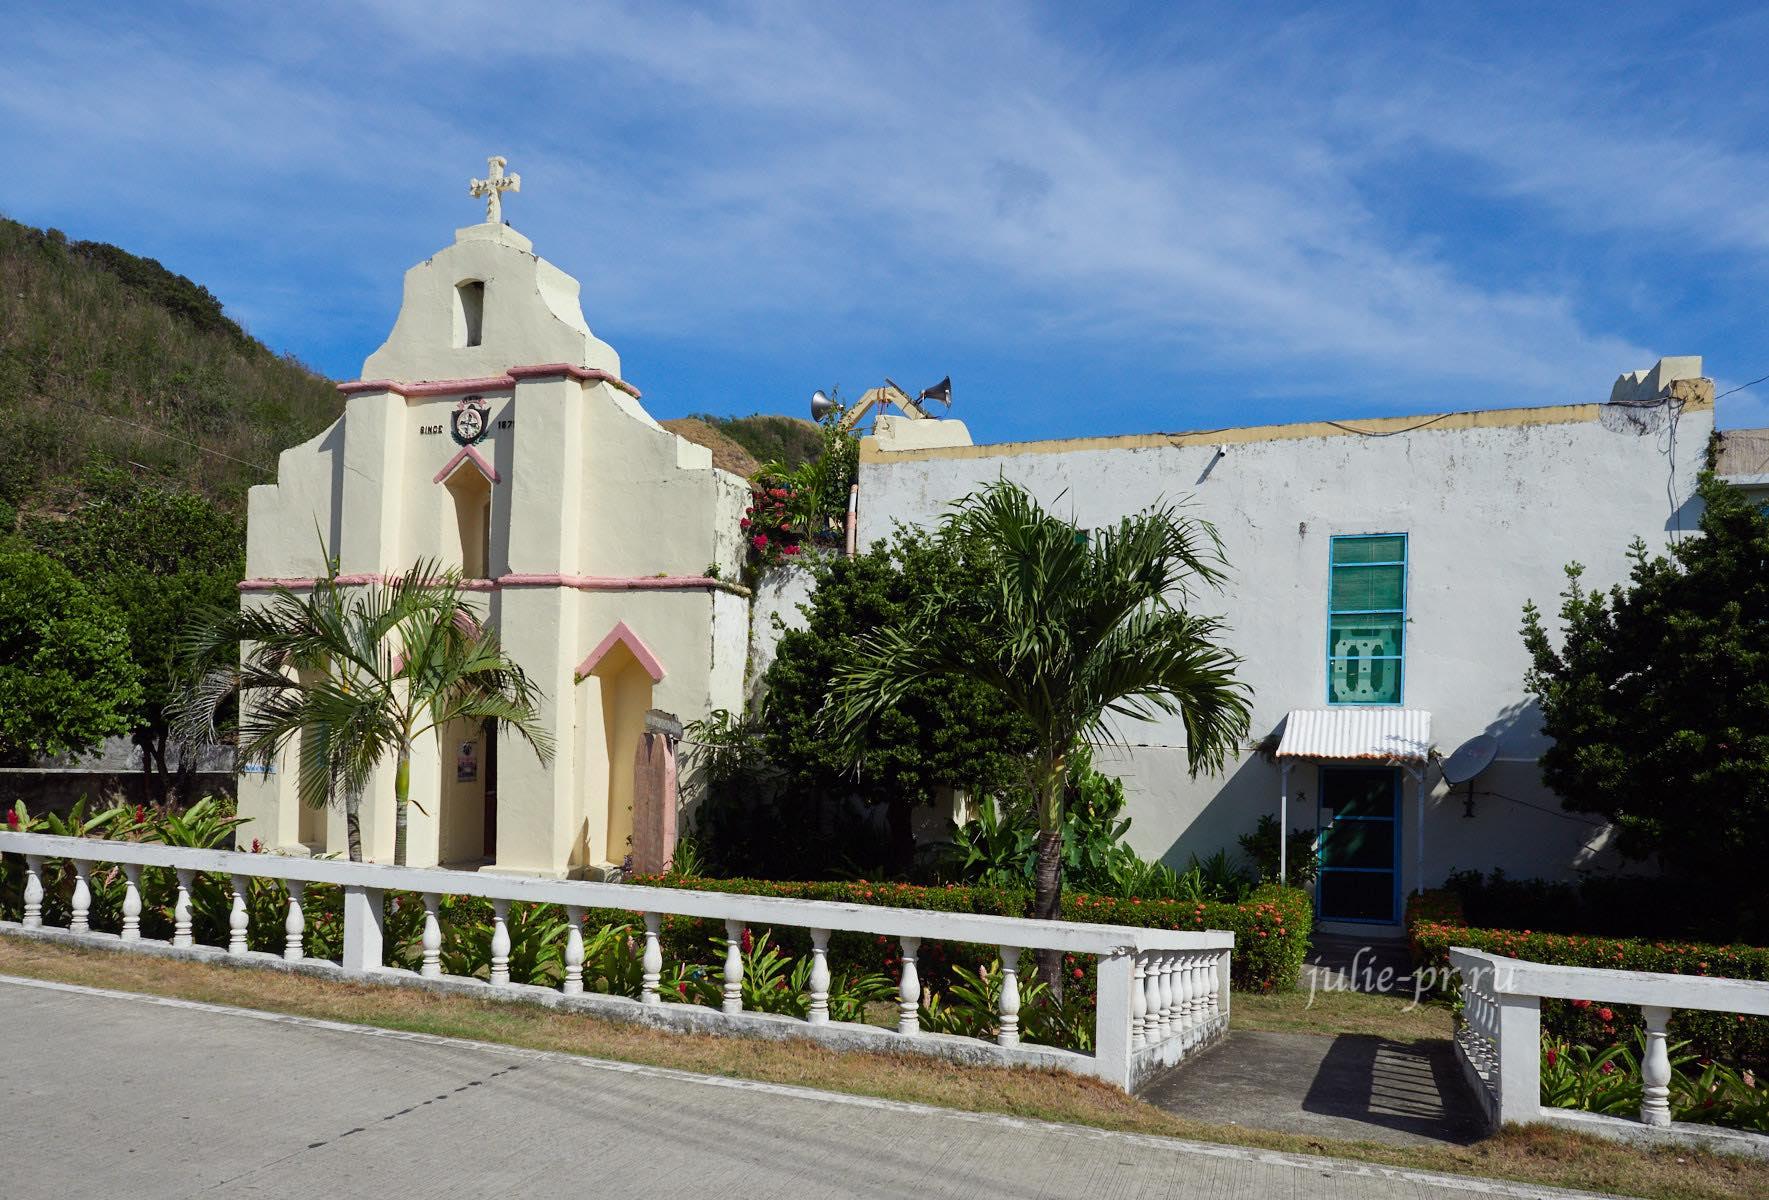 Филиппины, острова Батанес, Уюган, San Antonio Parish